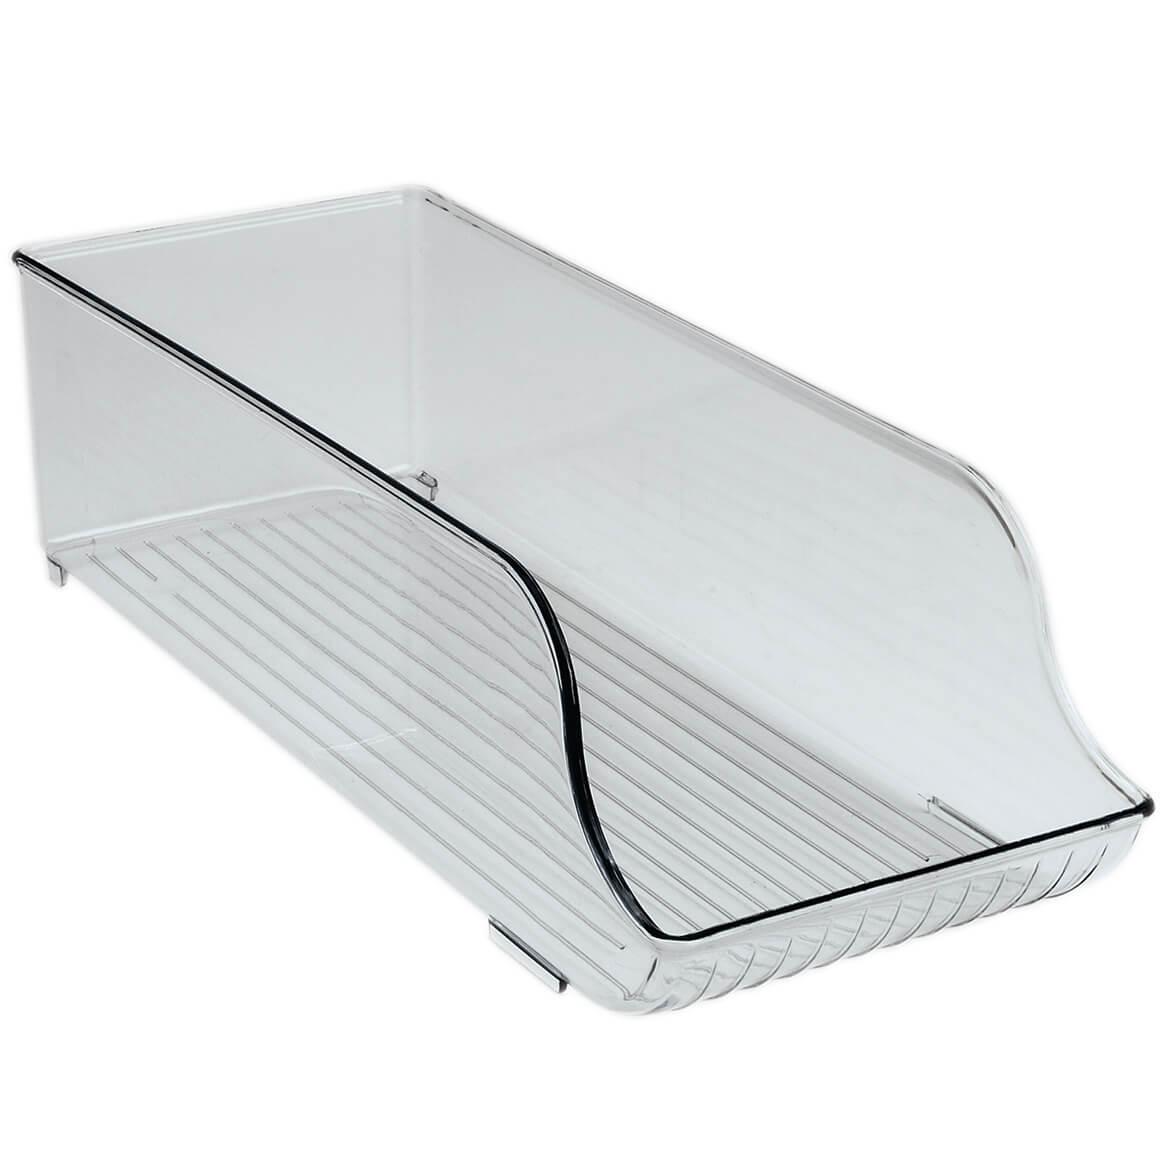 Creda Fridge Freezer Door Shelf Bottle Tray CW70 CW81 White Plastic